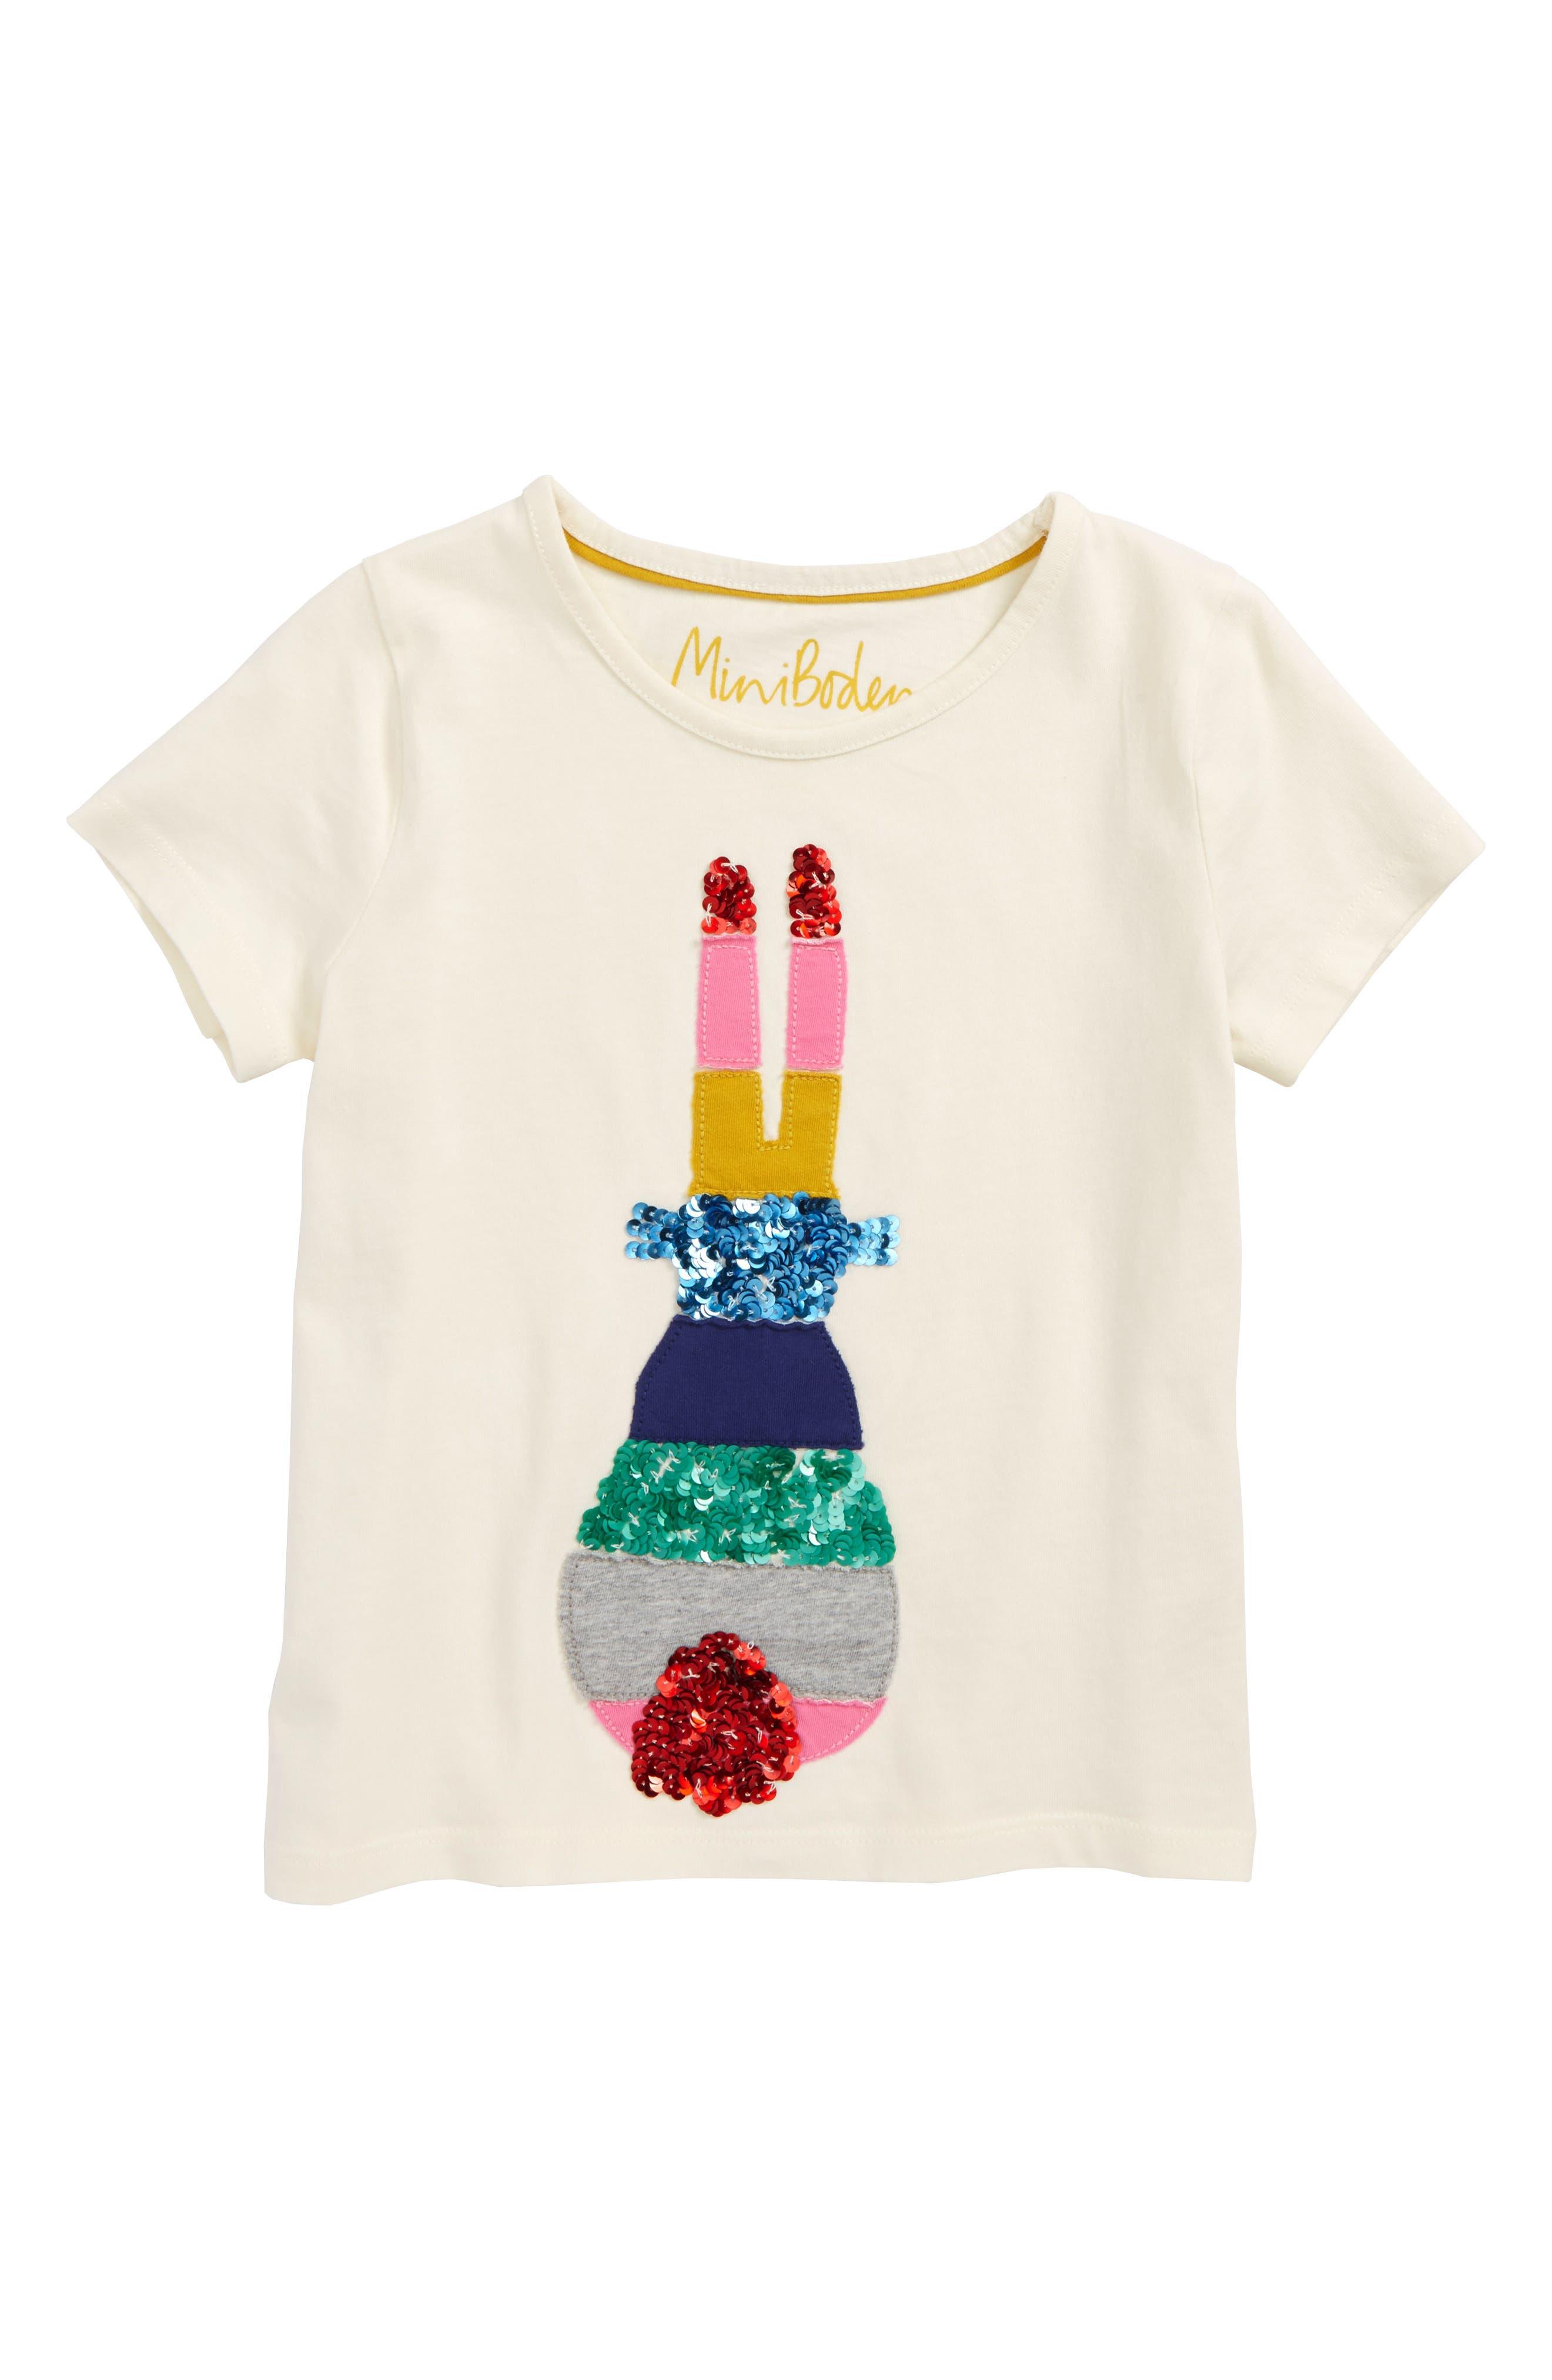 Alternate Image 1 Selected - Mini Boden Sequin Rainbow Tee (Toddler Girls, Little Girls & Big Girls)